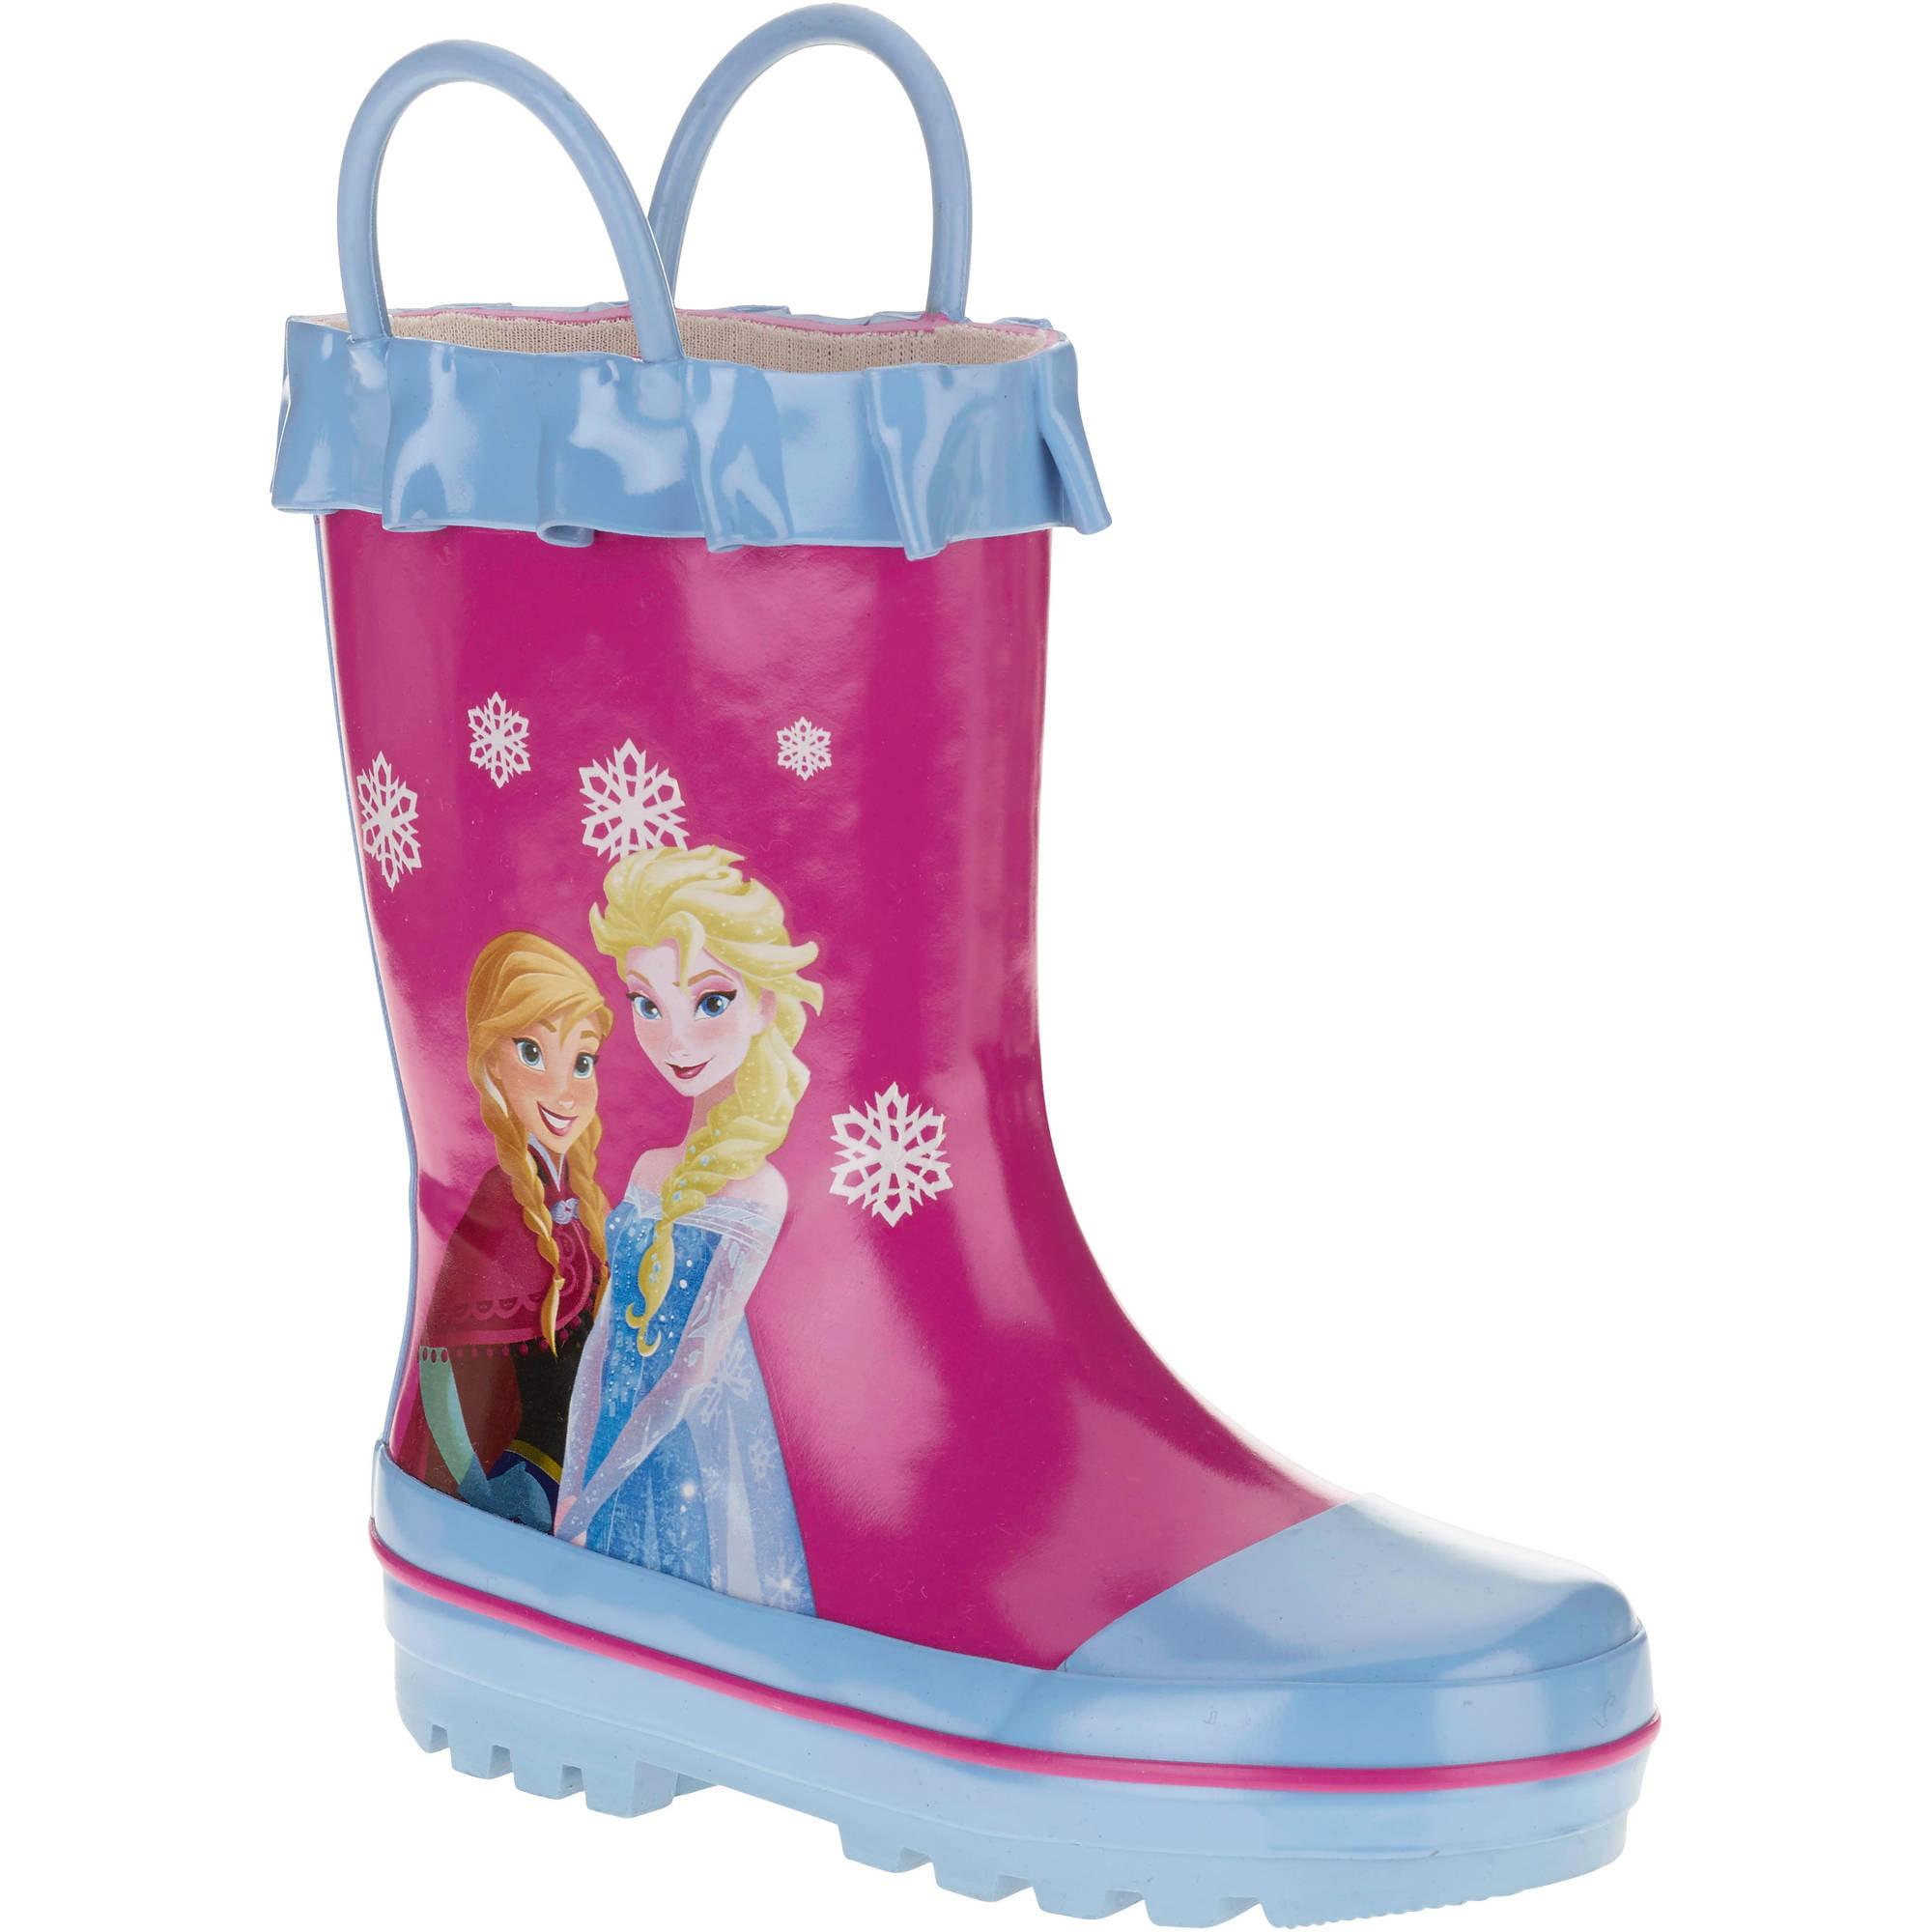 Disney Frozen Toddler Girls' Rainboot